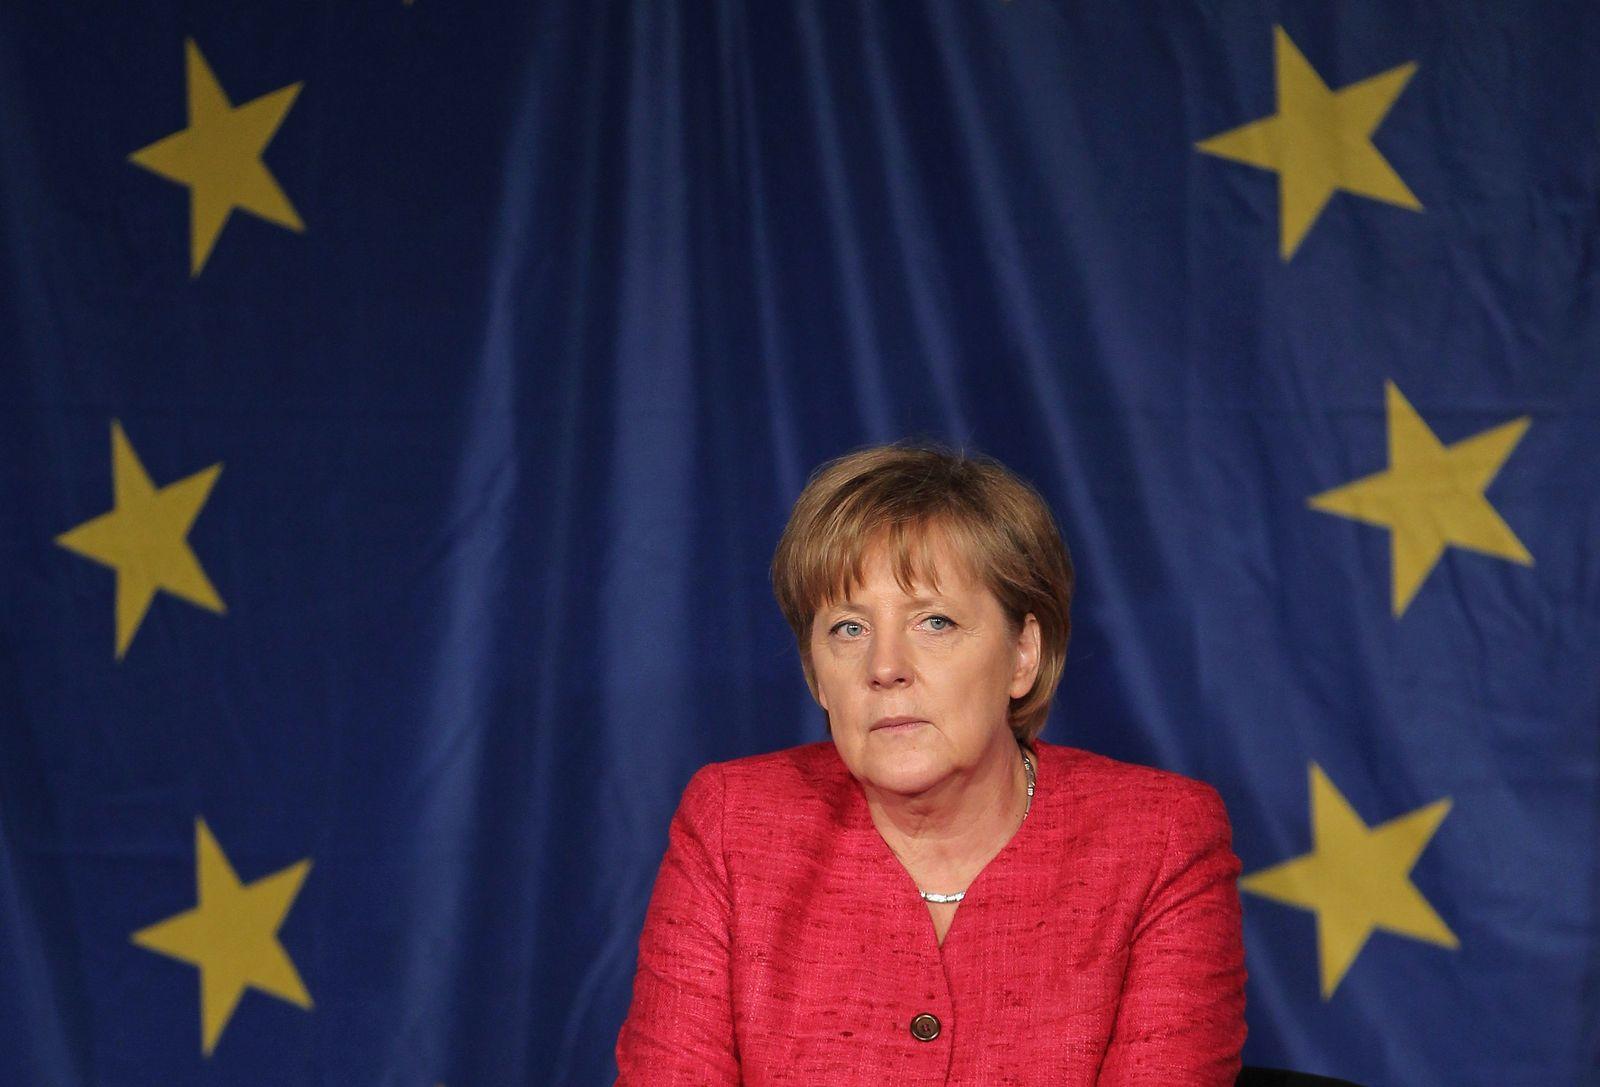 Merkel EU flag